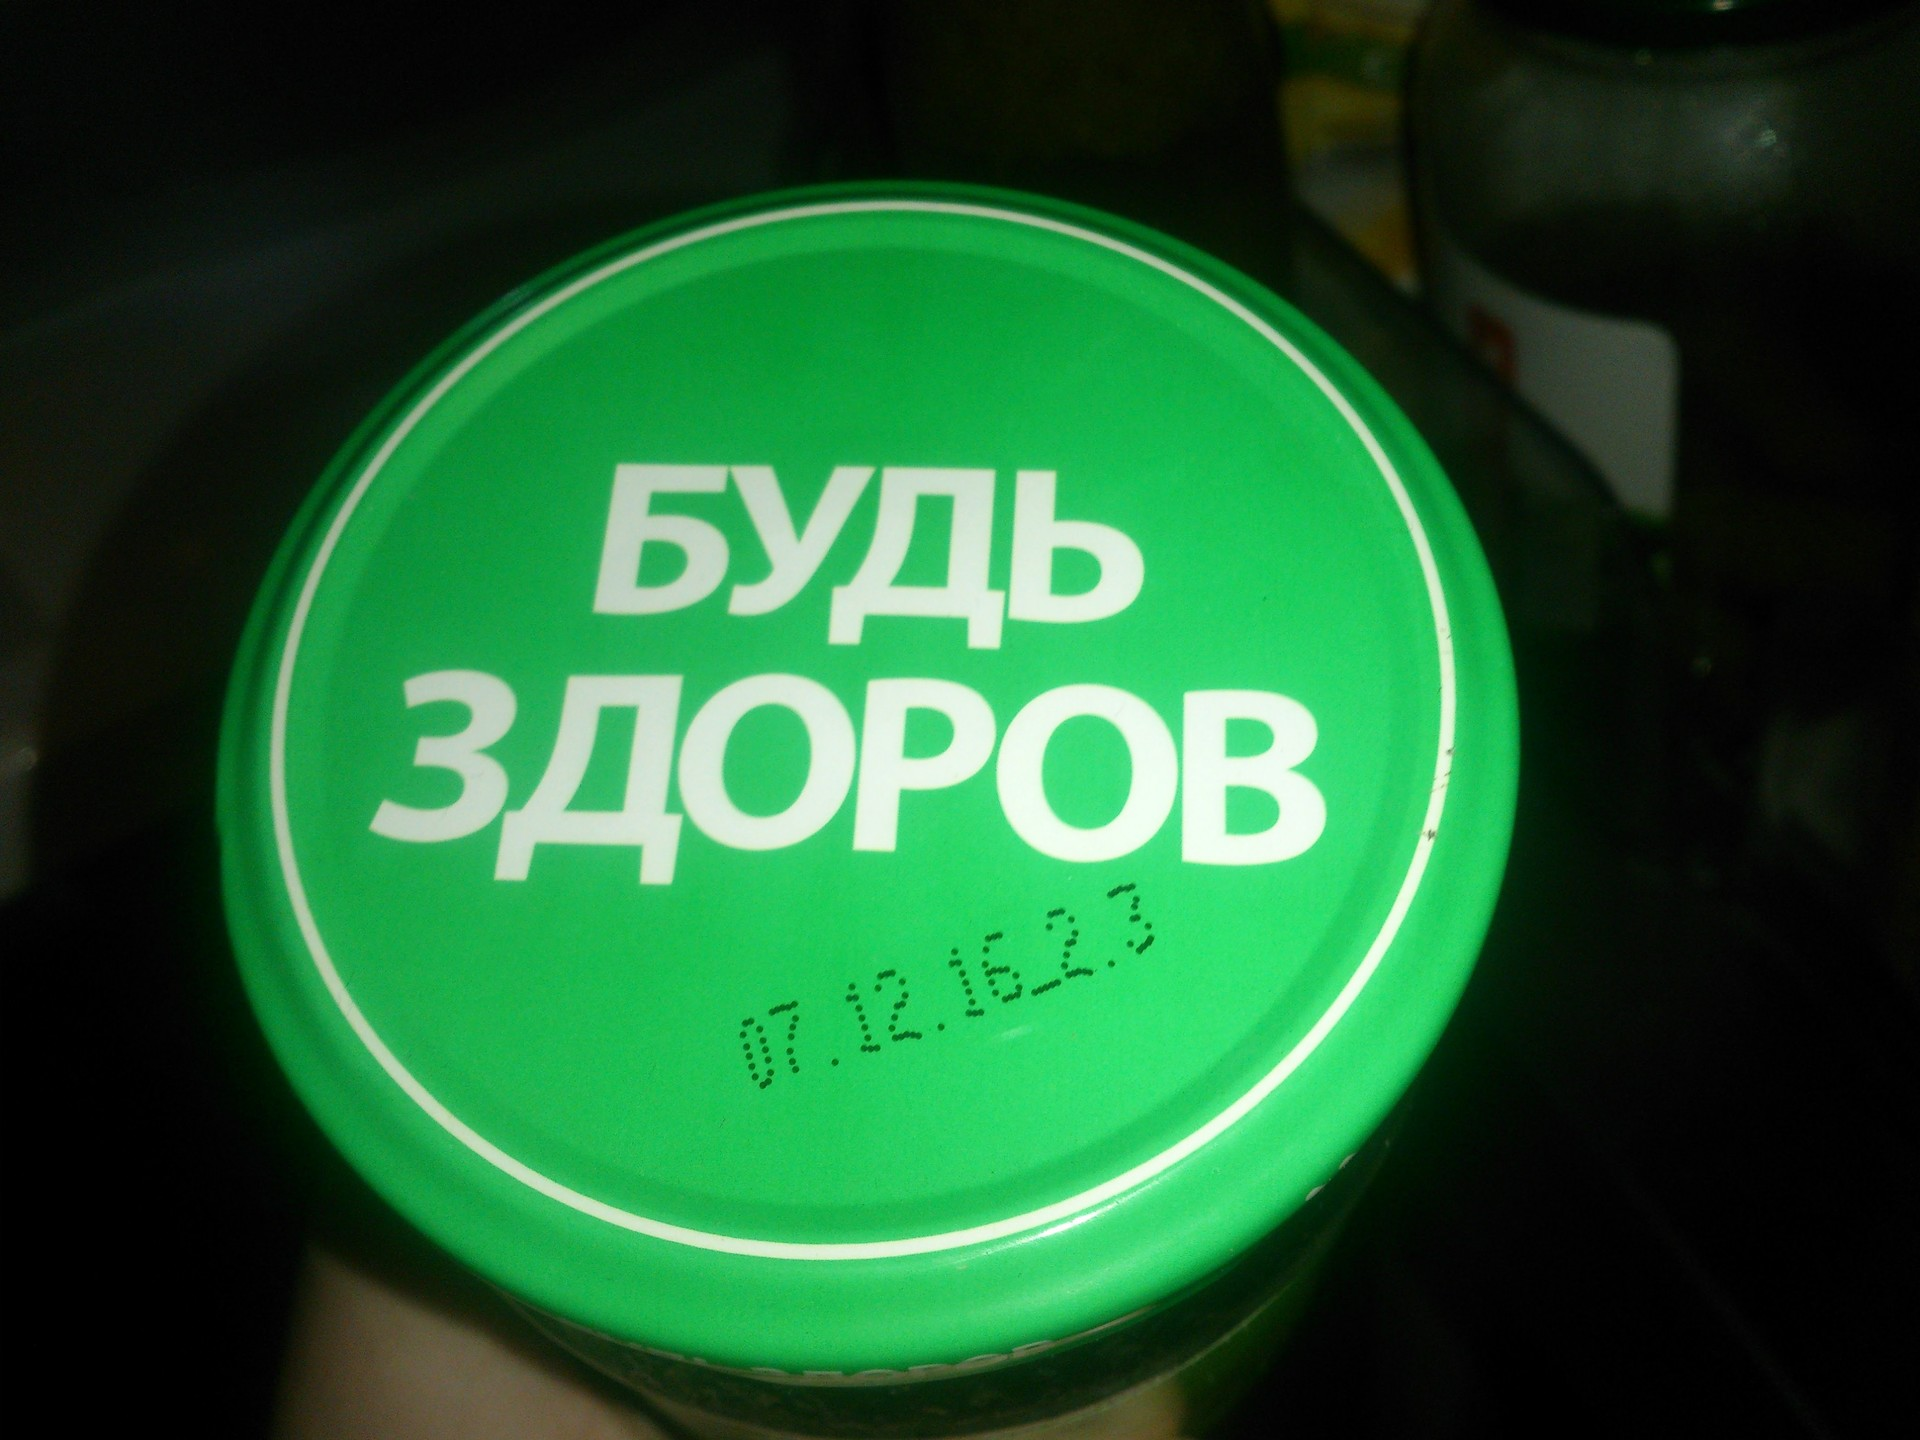 Tienda Belaruski